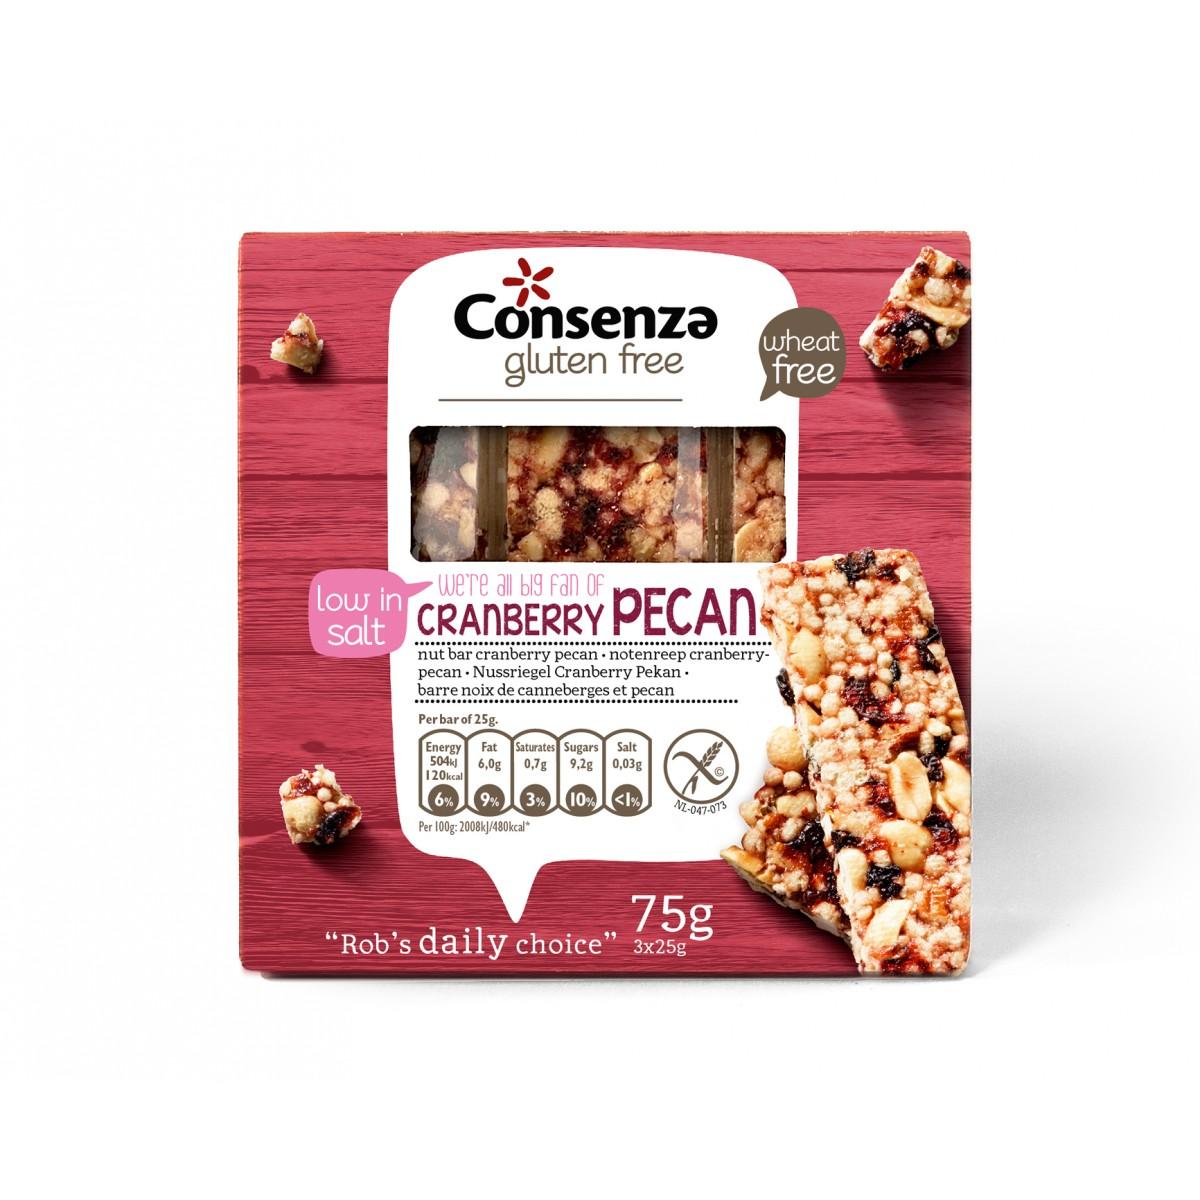 Cranberry-Pecan Notenreep